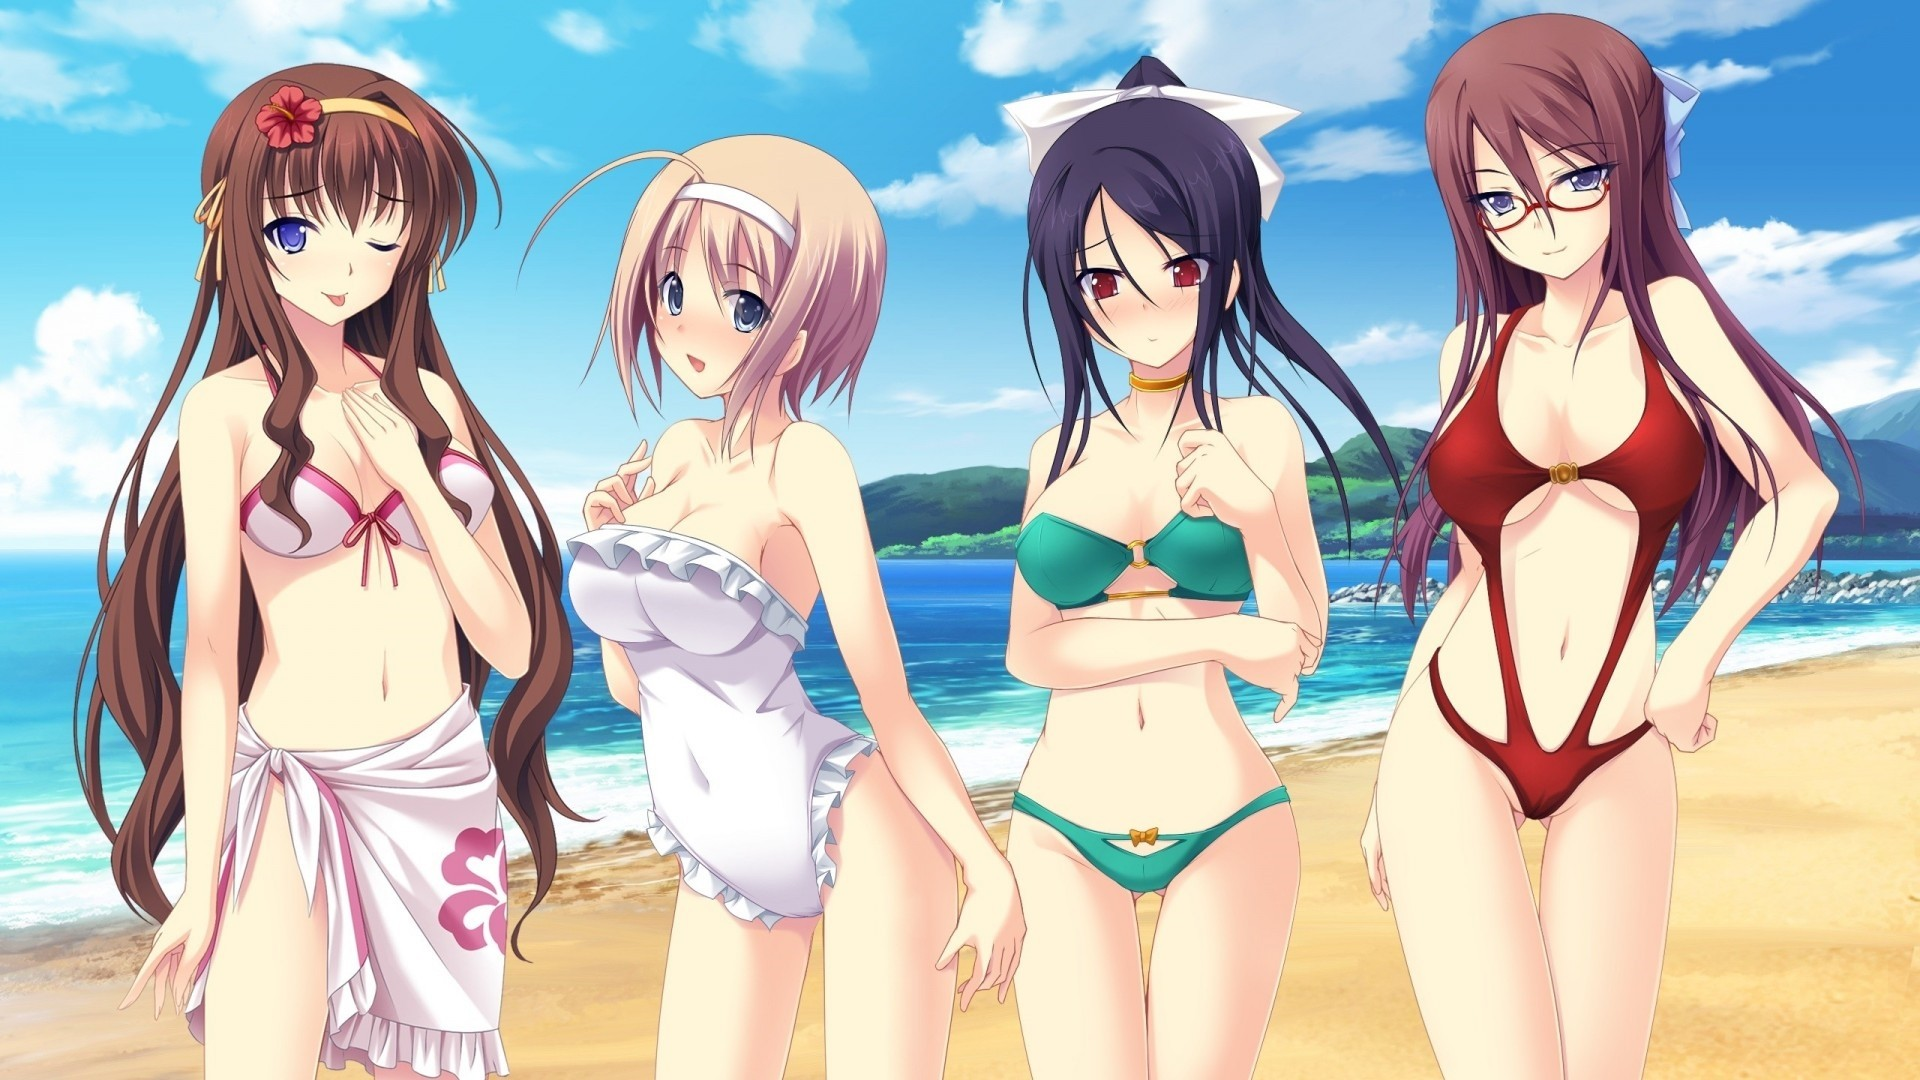 Anime Bikini Free Wallpaper and Background